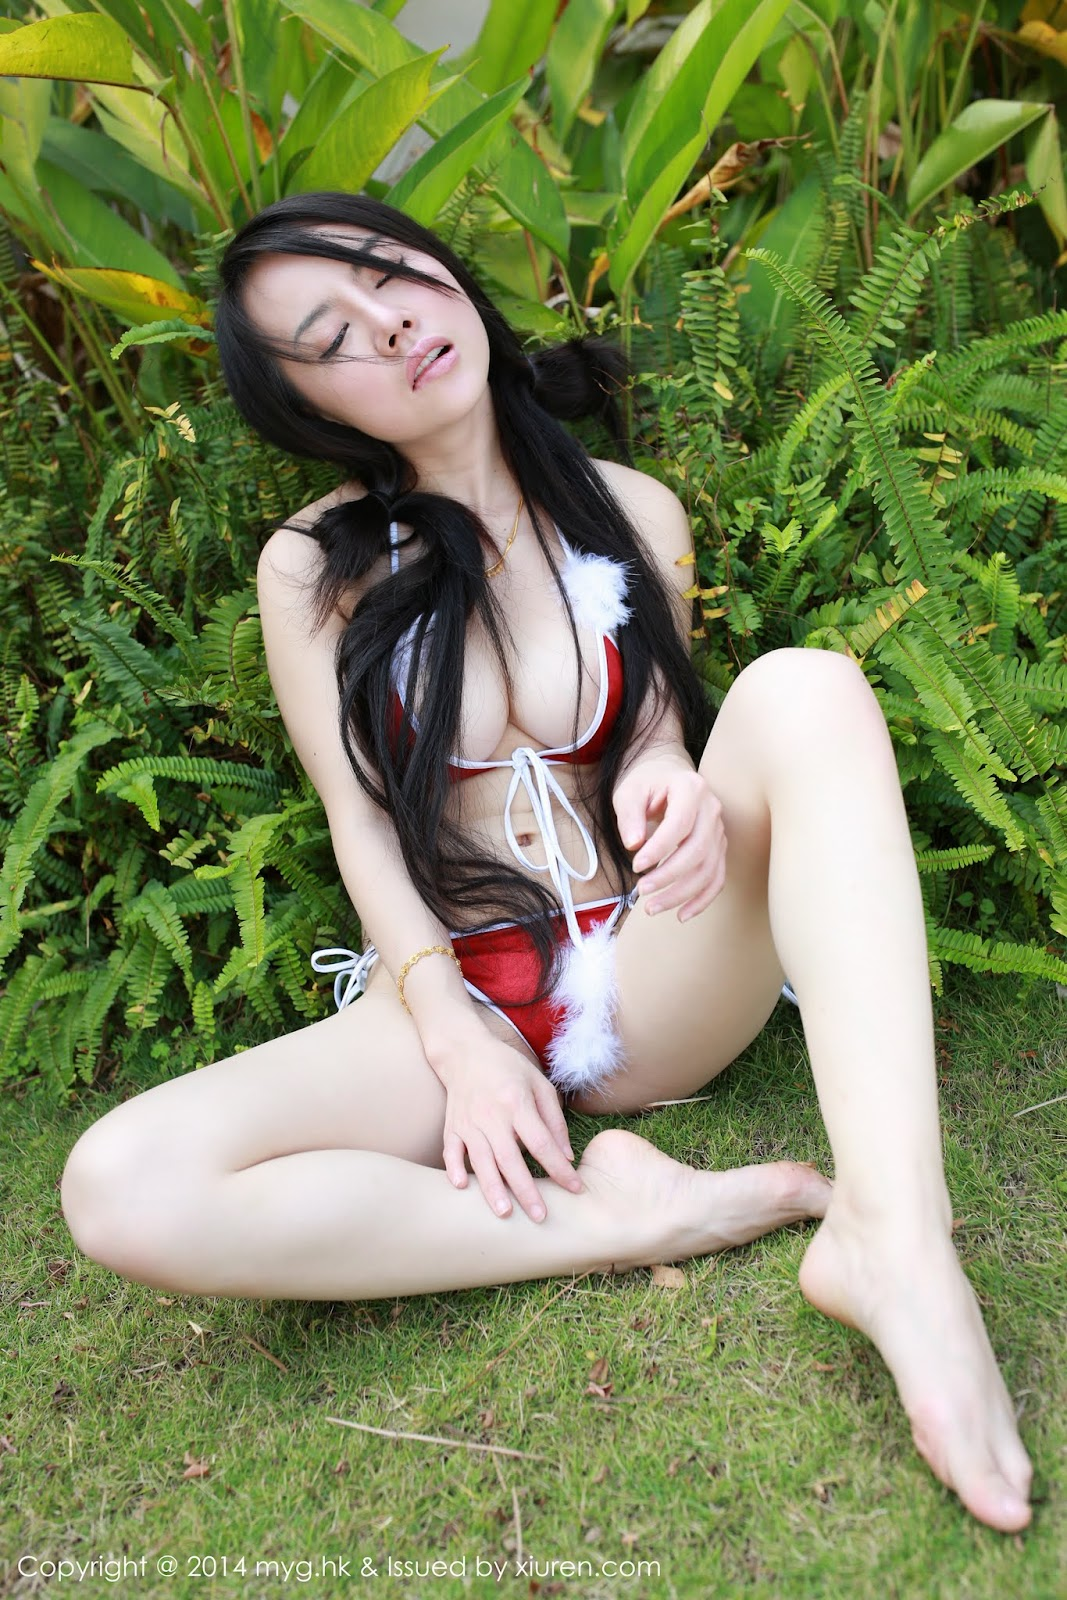 30036 057 - MYGIRL VOL.30 Photo Nude Hot Sexy